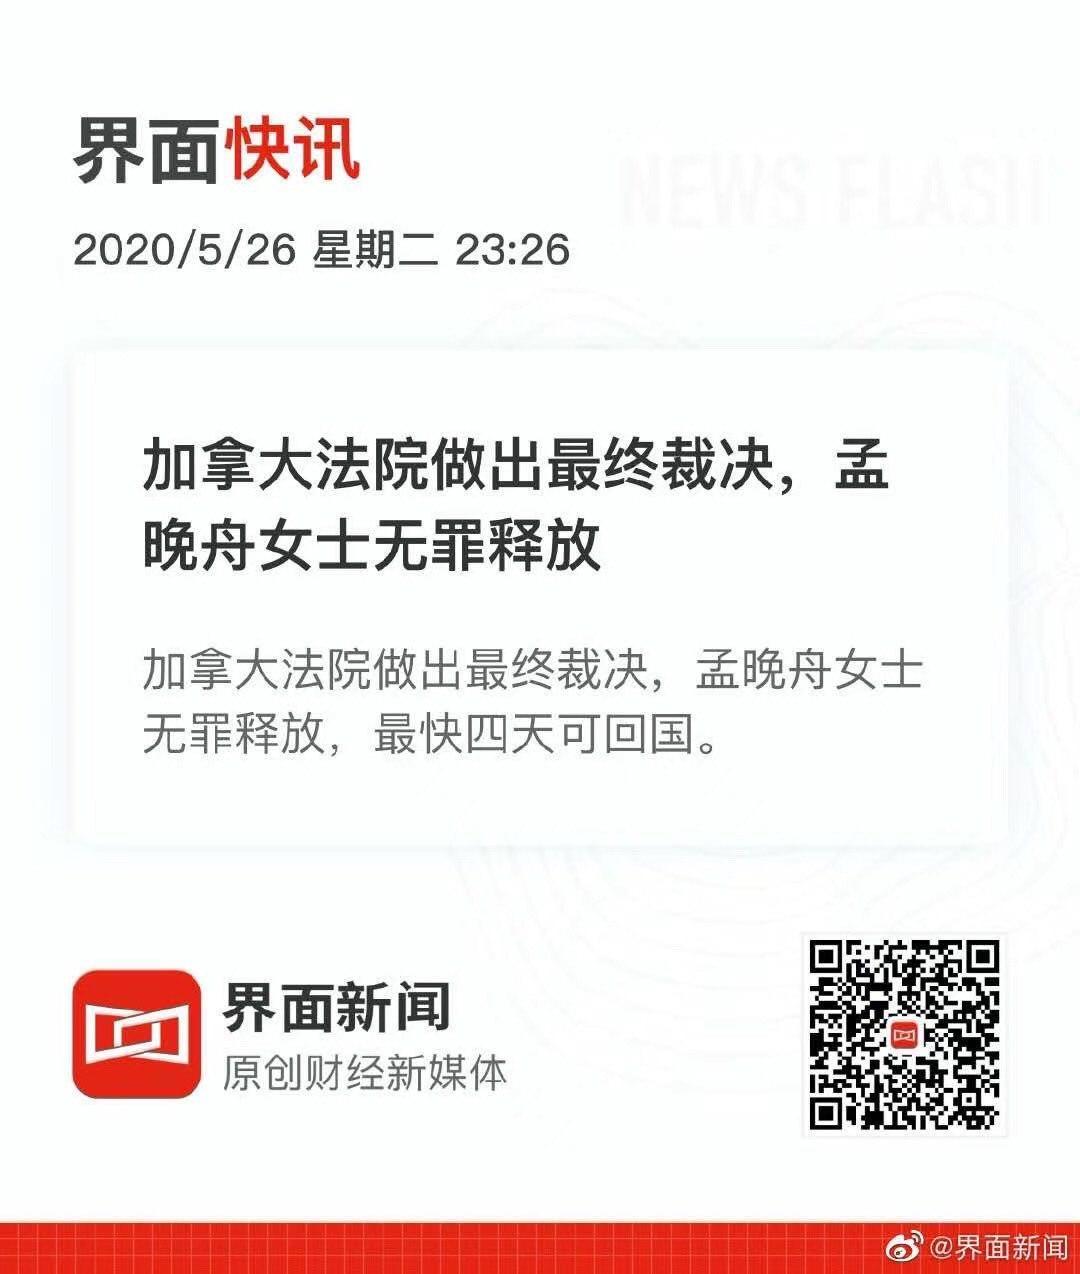 https://raw.githubusercontent.com/tyuans/tyuans-images/master/99D7041A-99D2-4675-90E9-380B4FC6287D.jpeg